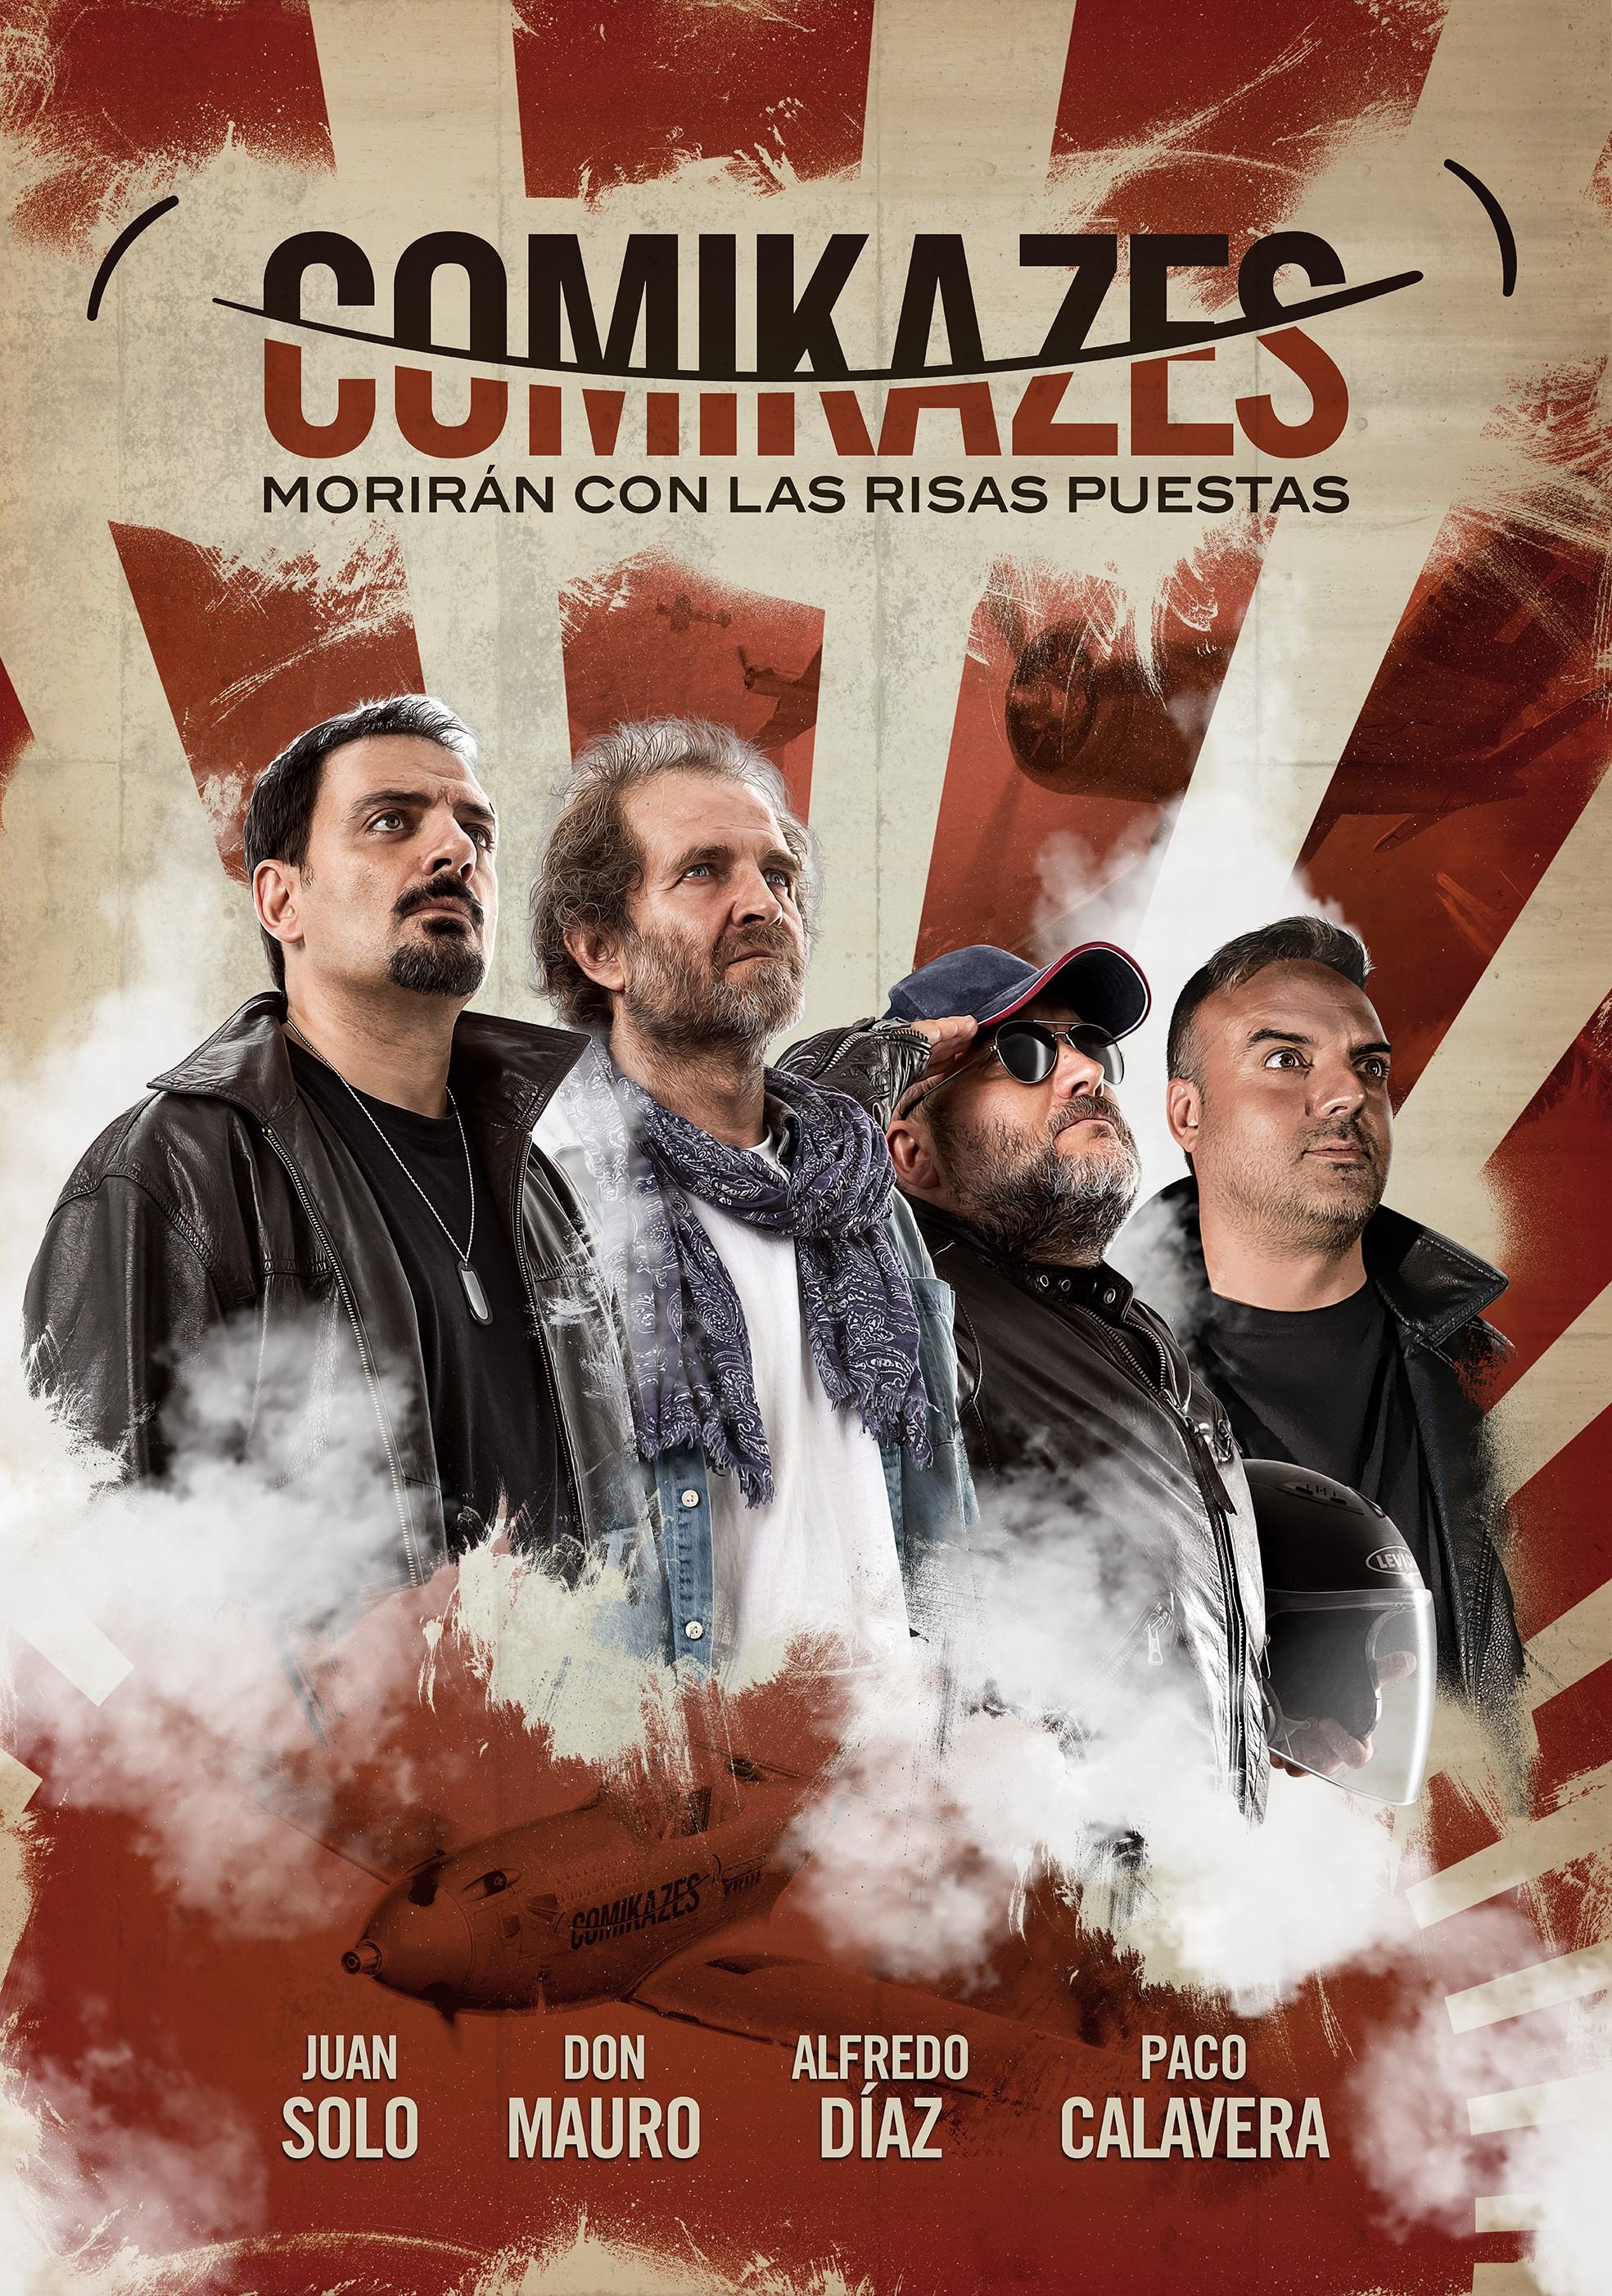 La Gira de los Comikazes - Morirán con las risas puestas - Comikazes - Juan Solo - Don Mauro - Alfredo Díaz - Paco Calavera